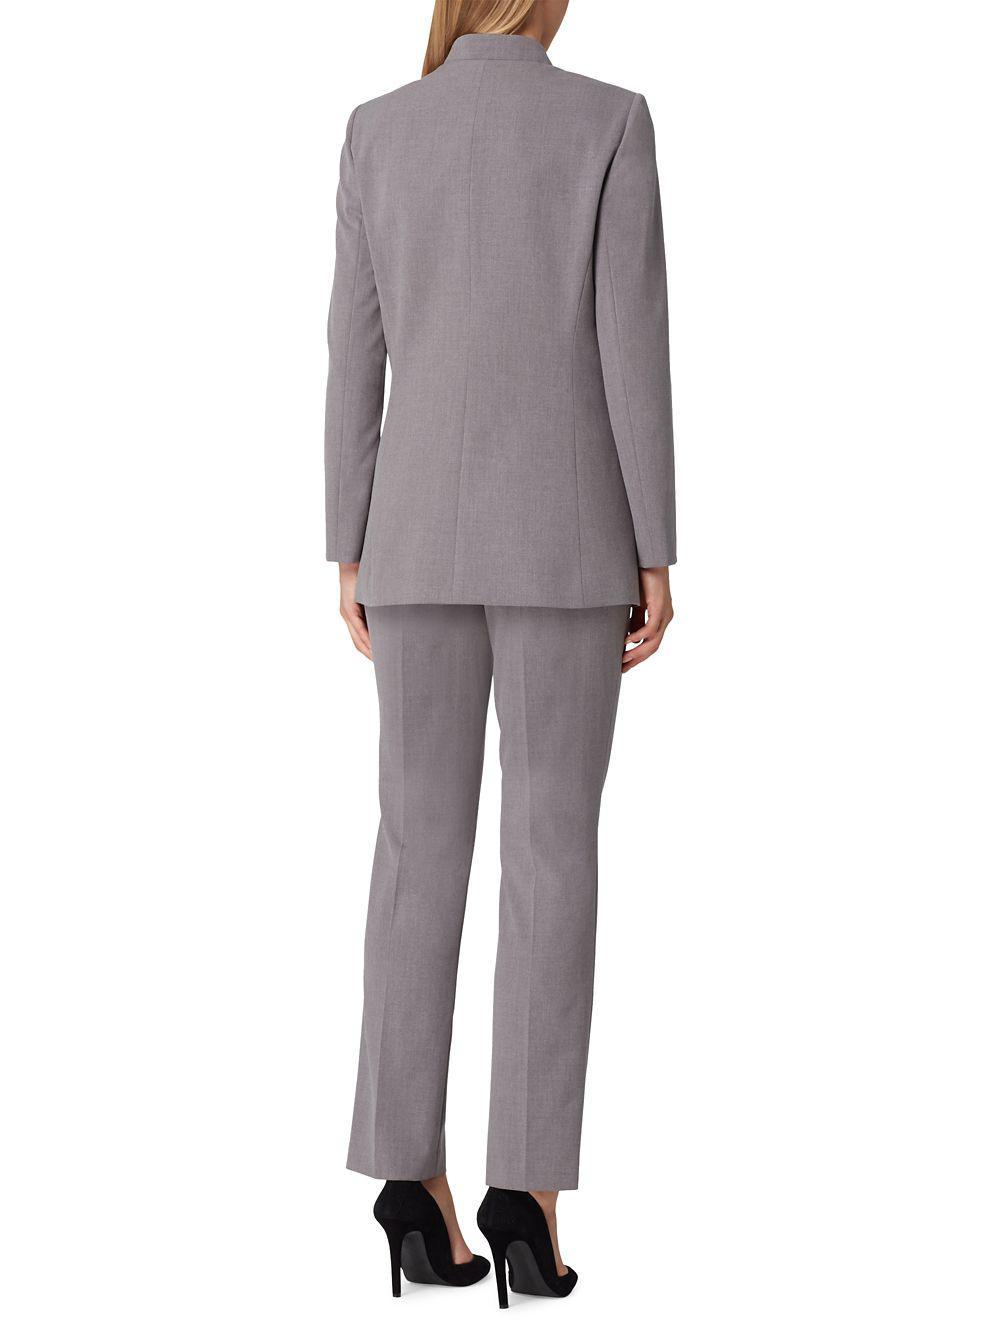 304f74976f654 Tahari - Gray Double Starneck Pant Suit - Lyst. View fullscreen